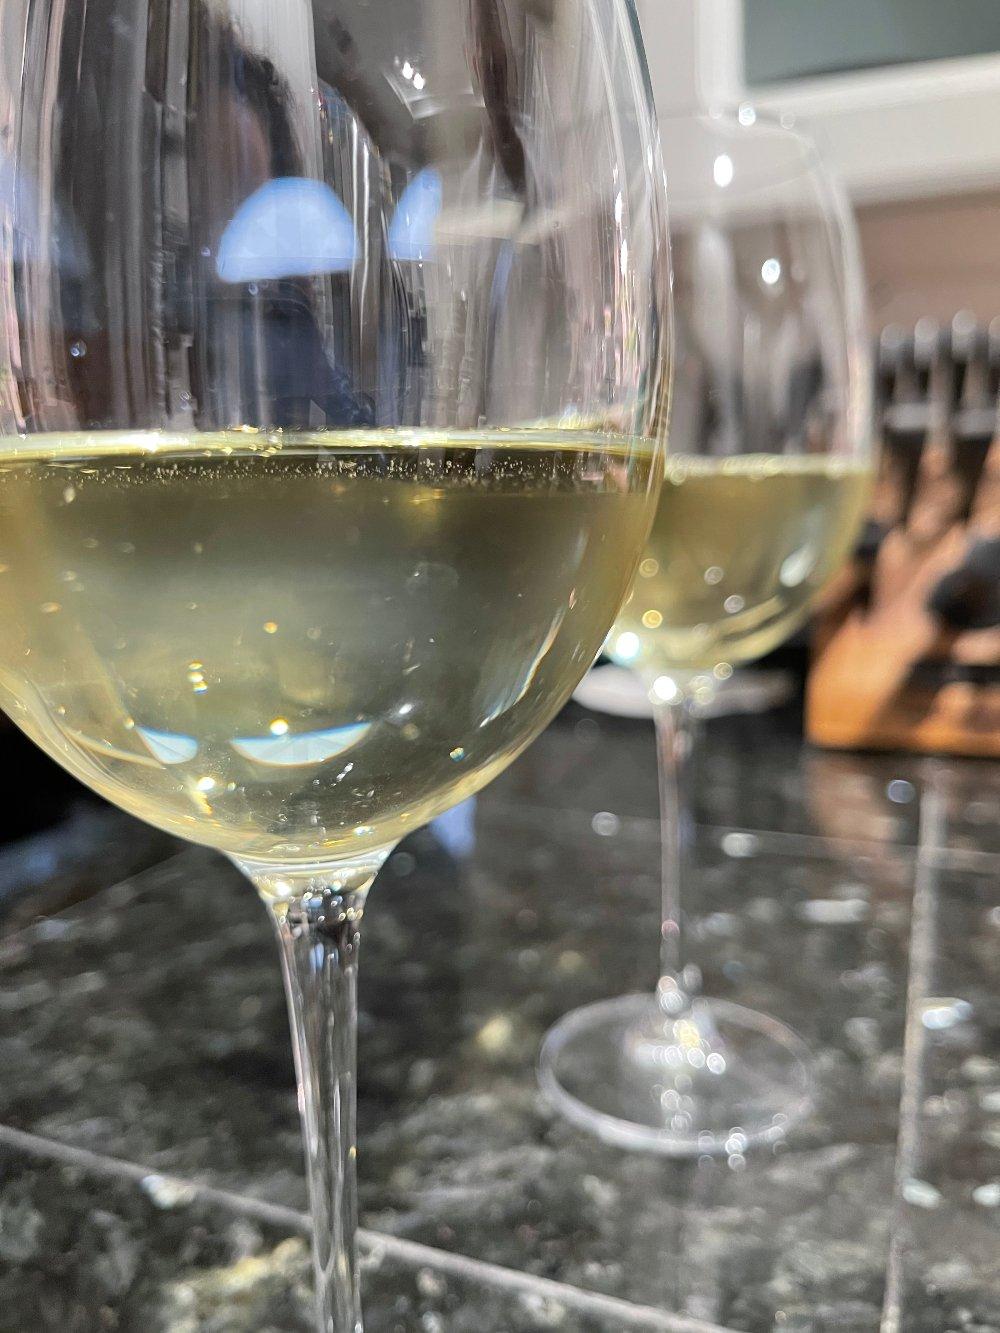 20210615 MHayes Wine Glasses